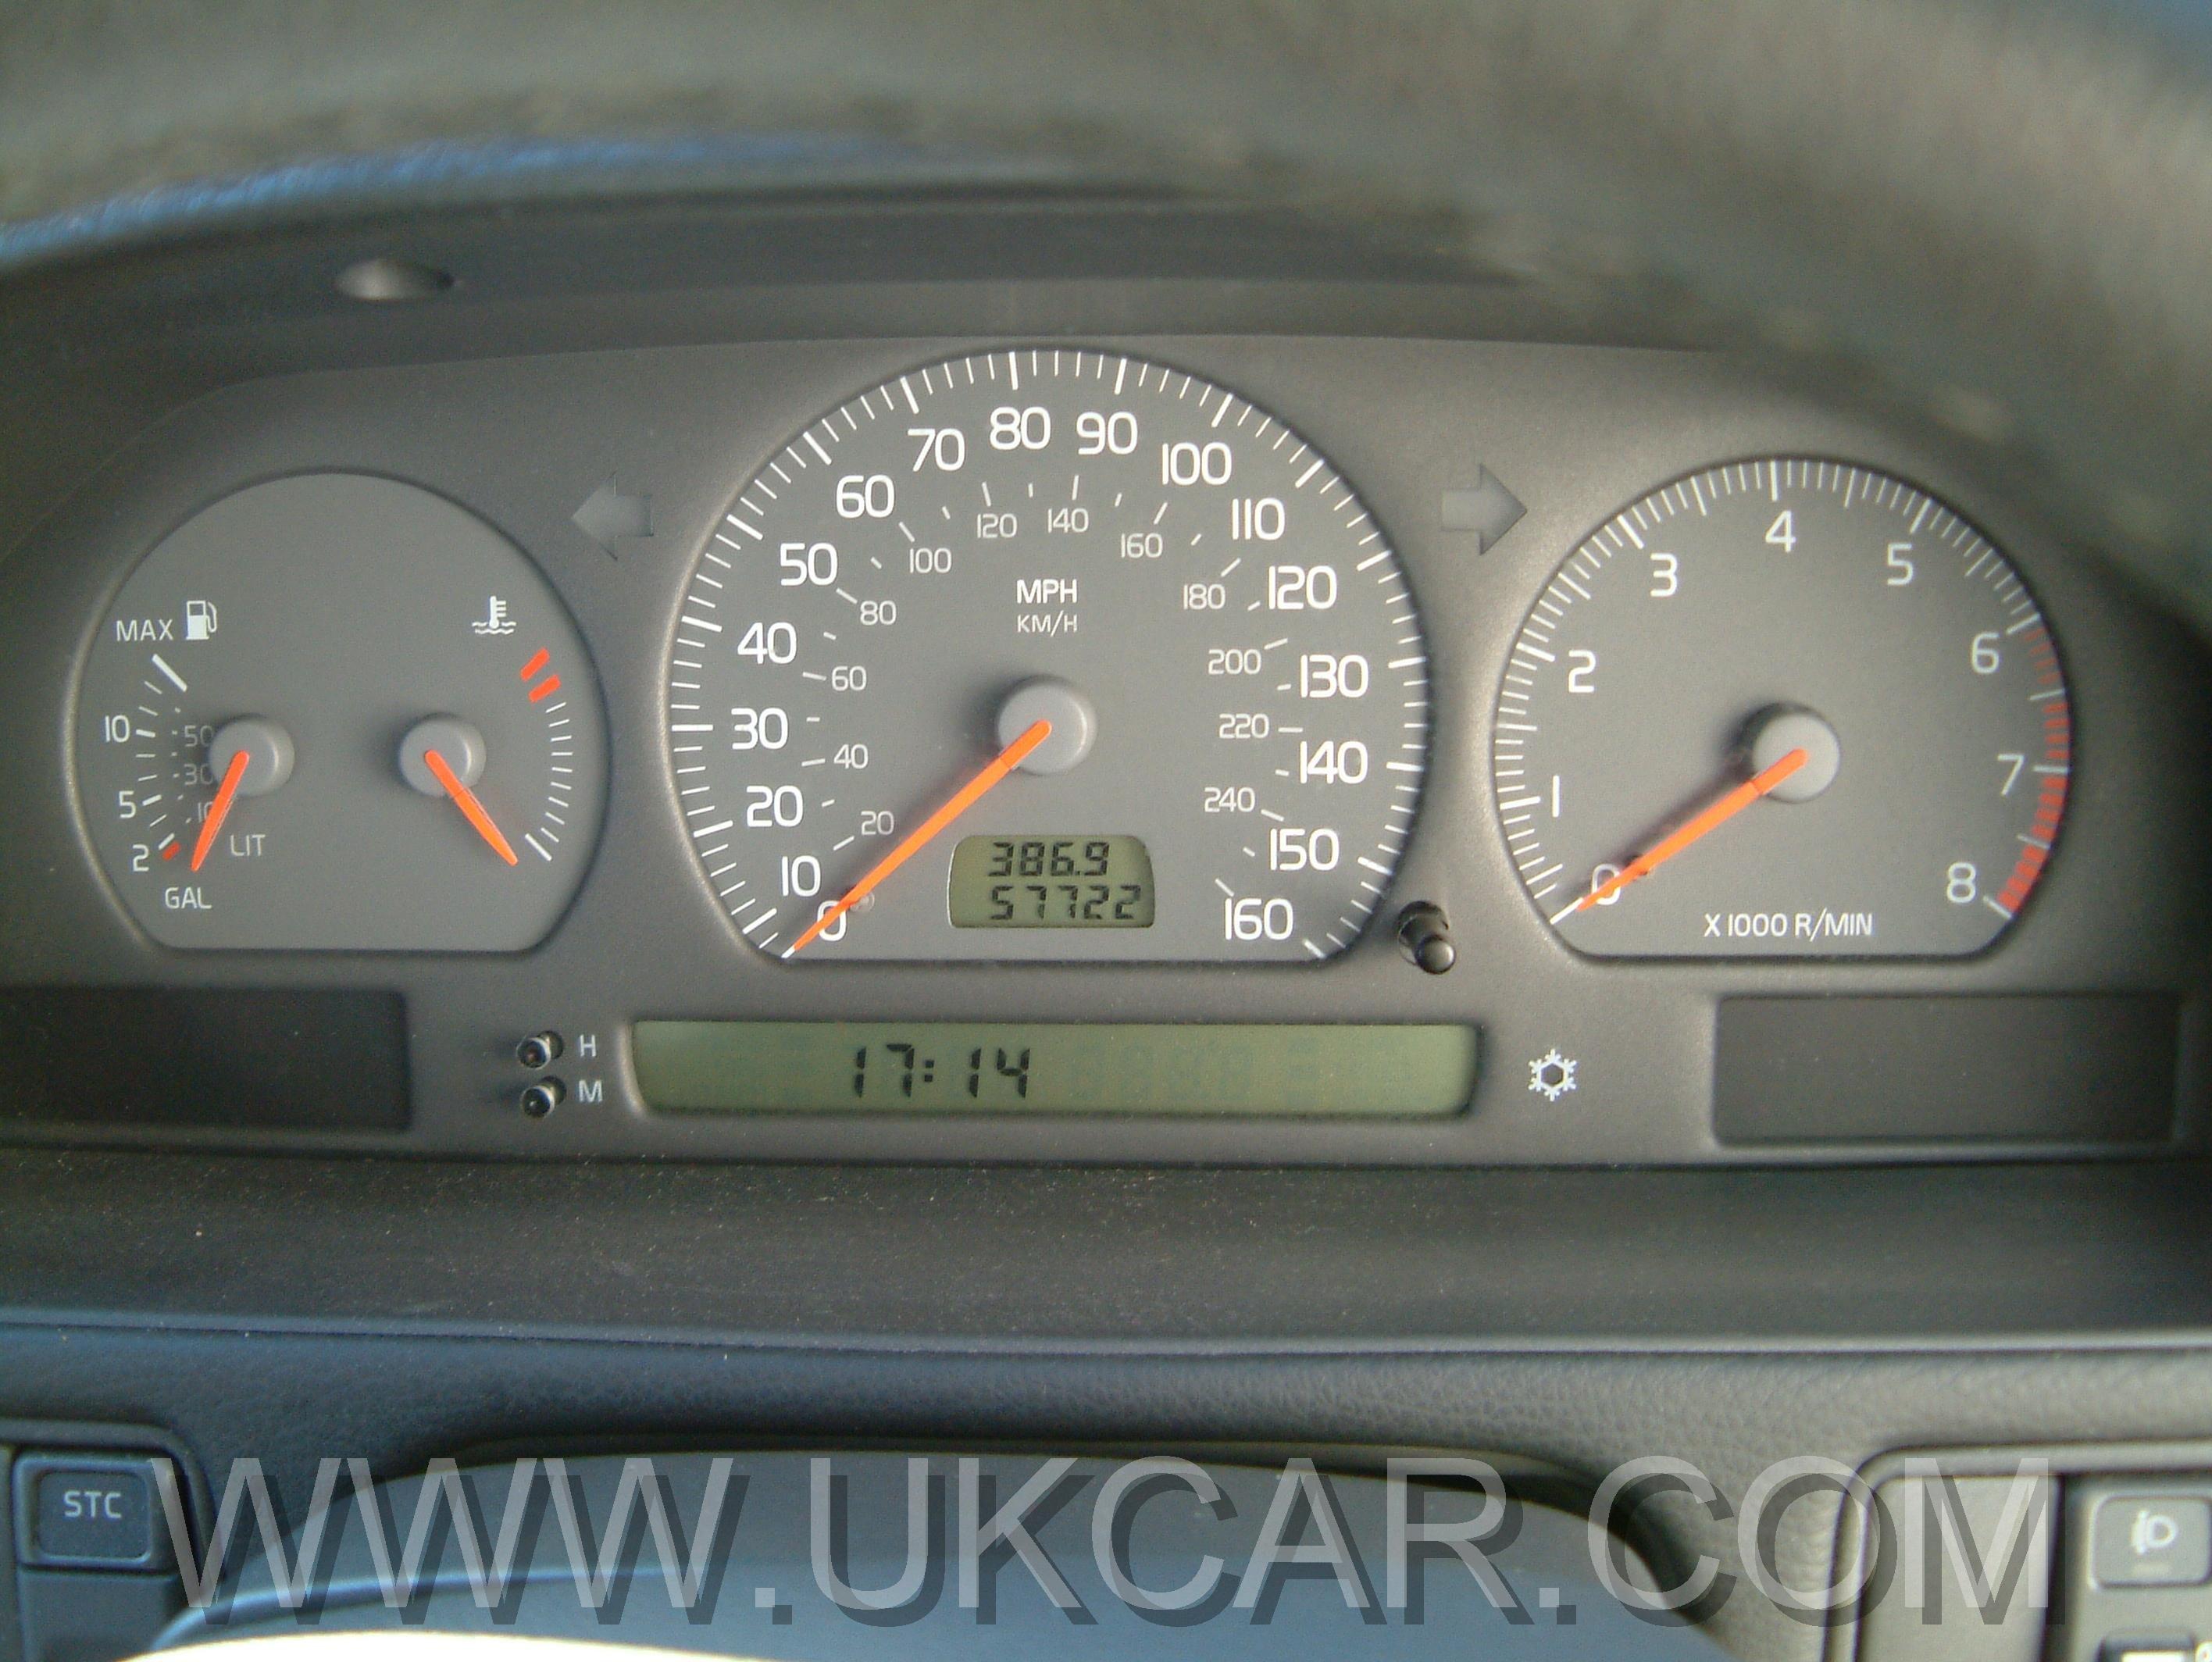 UK Car Road Test